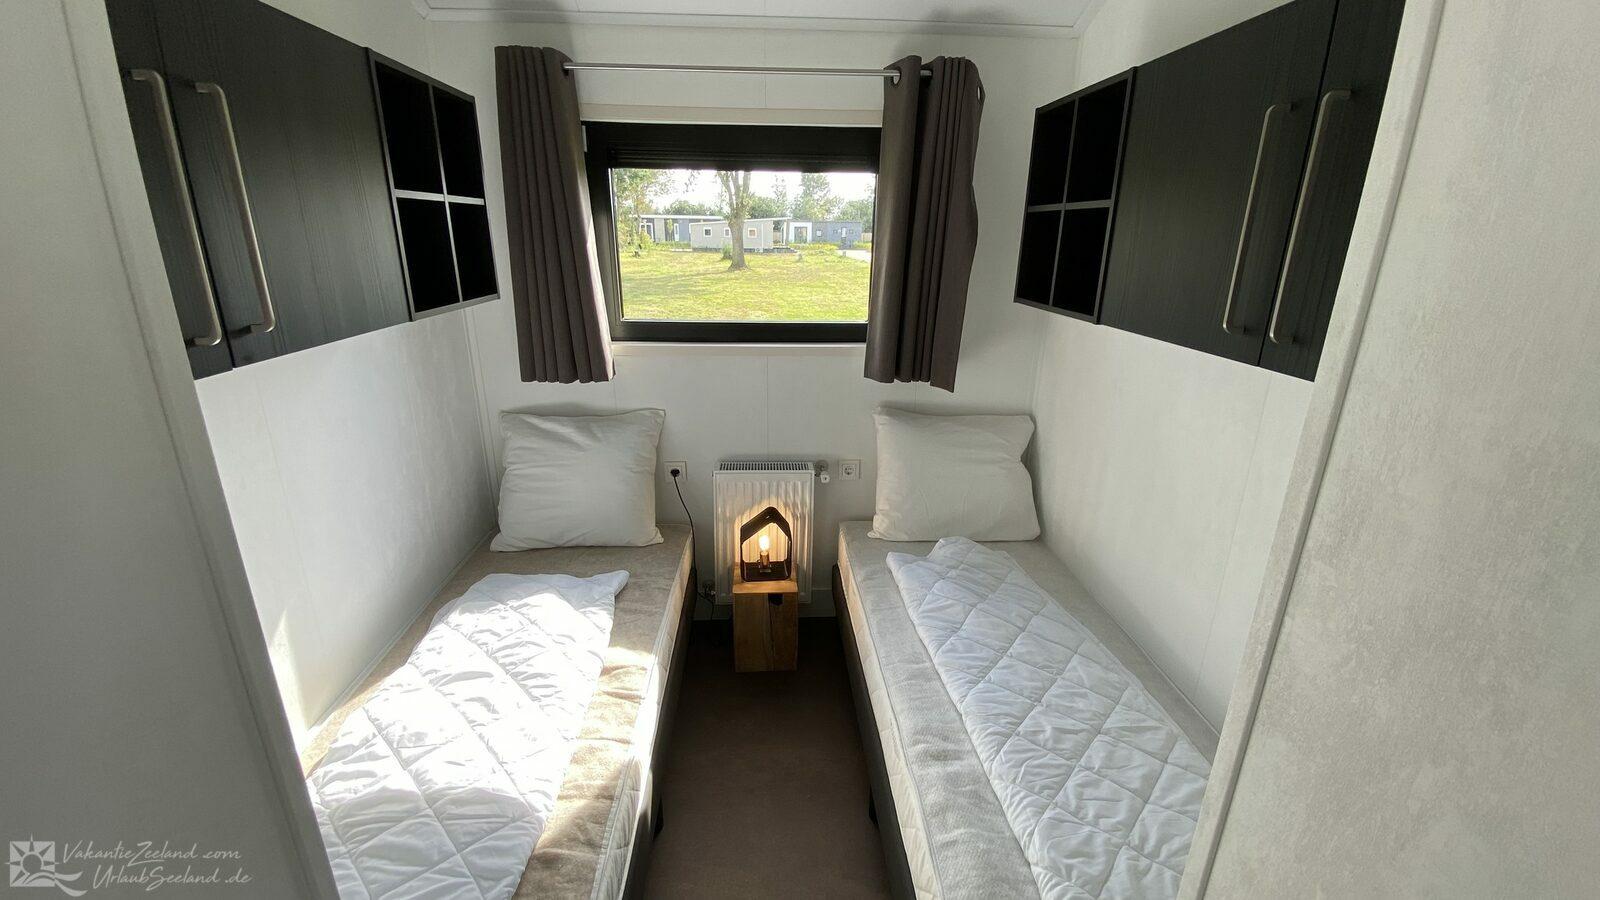 VZ1035 Luxus-Ferienchalet in Scherpenisse